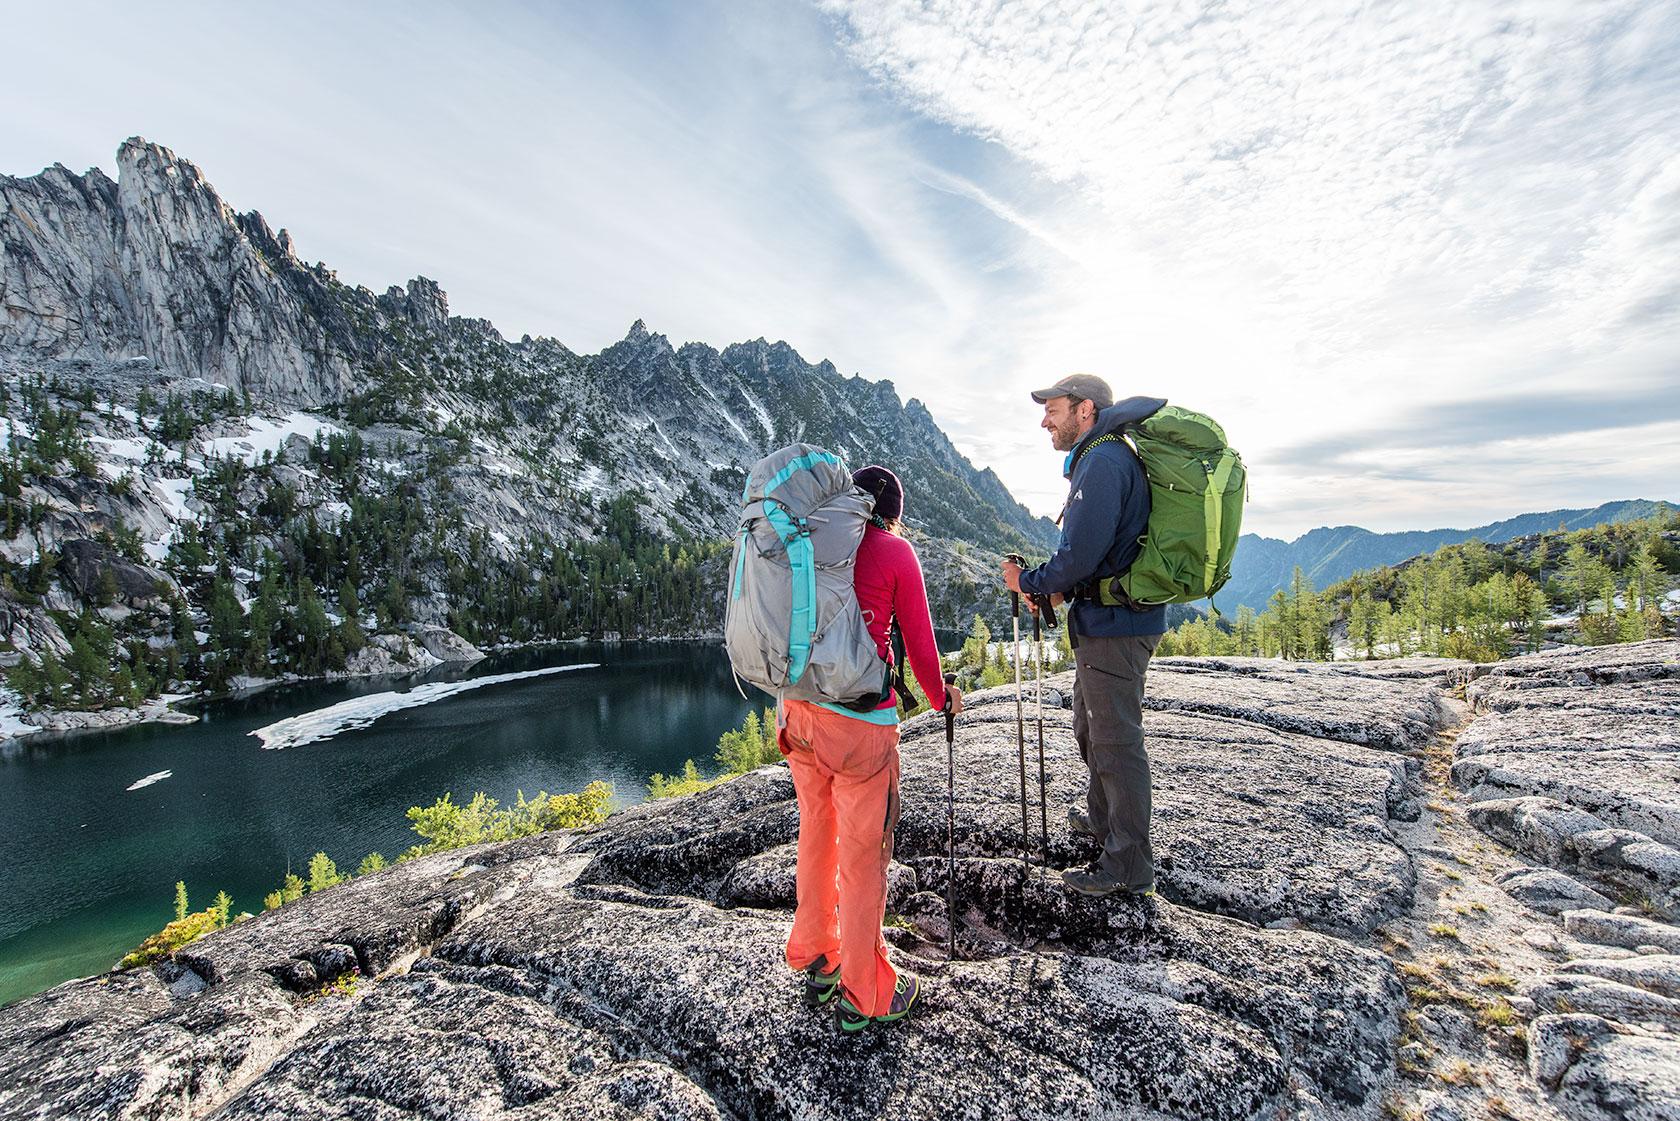 austin-trigg-osprey-hiking-backpacks-hike-camp-washington-adventure-morning-sunrise-lifestyle-outdoor-enchantments-lake-alpine-wilderness-talk.jpg